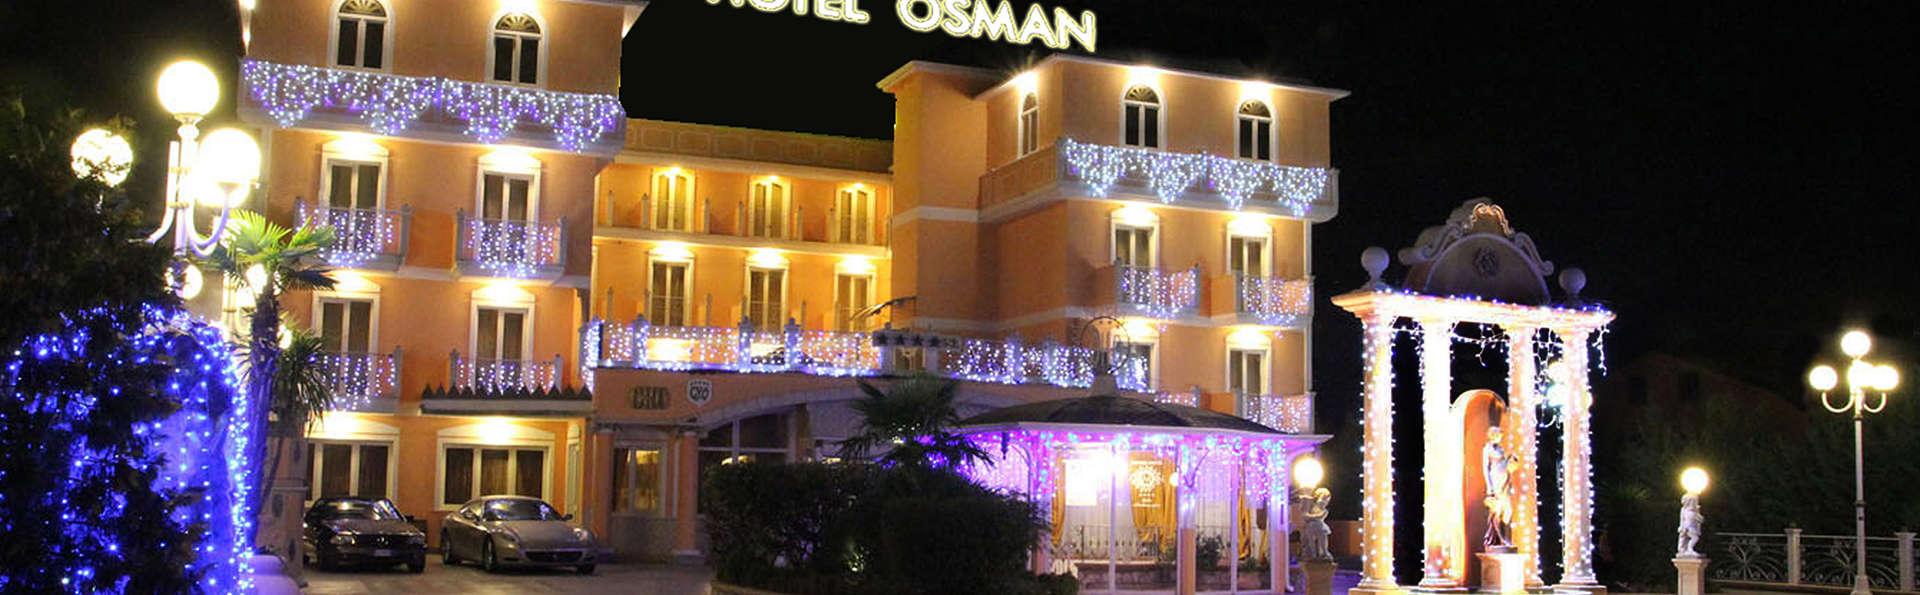 Grand Hotel Osman - edit_front_night.jpg